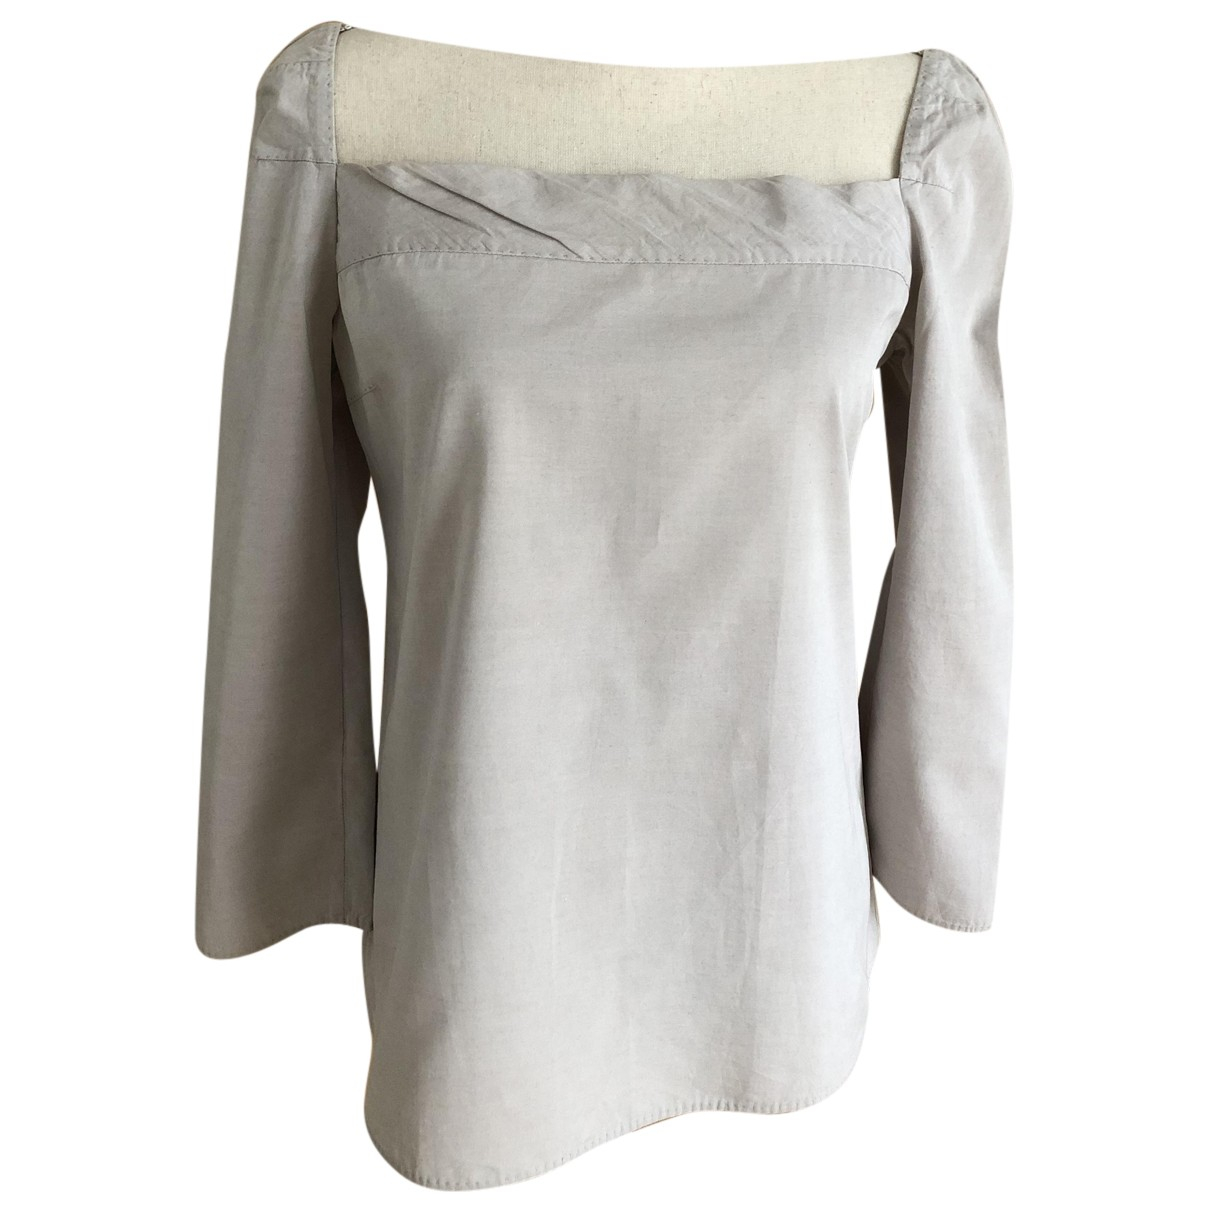 Louis Vuitton N Grey Cotton  top for Women 38 FR